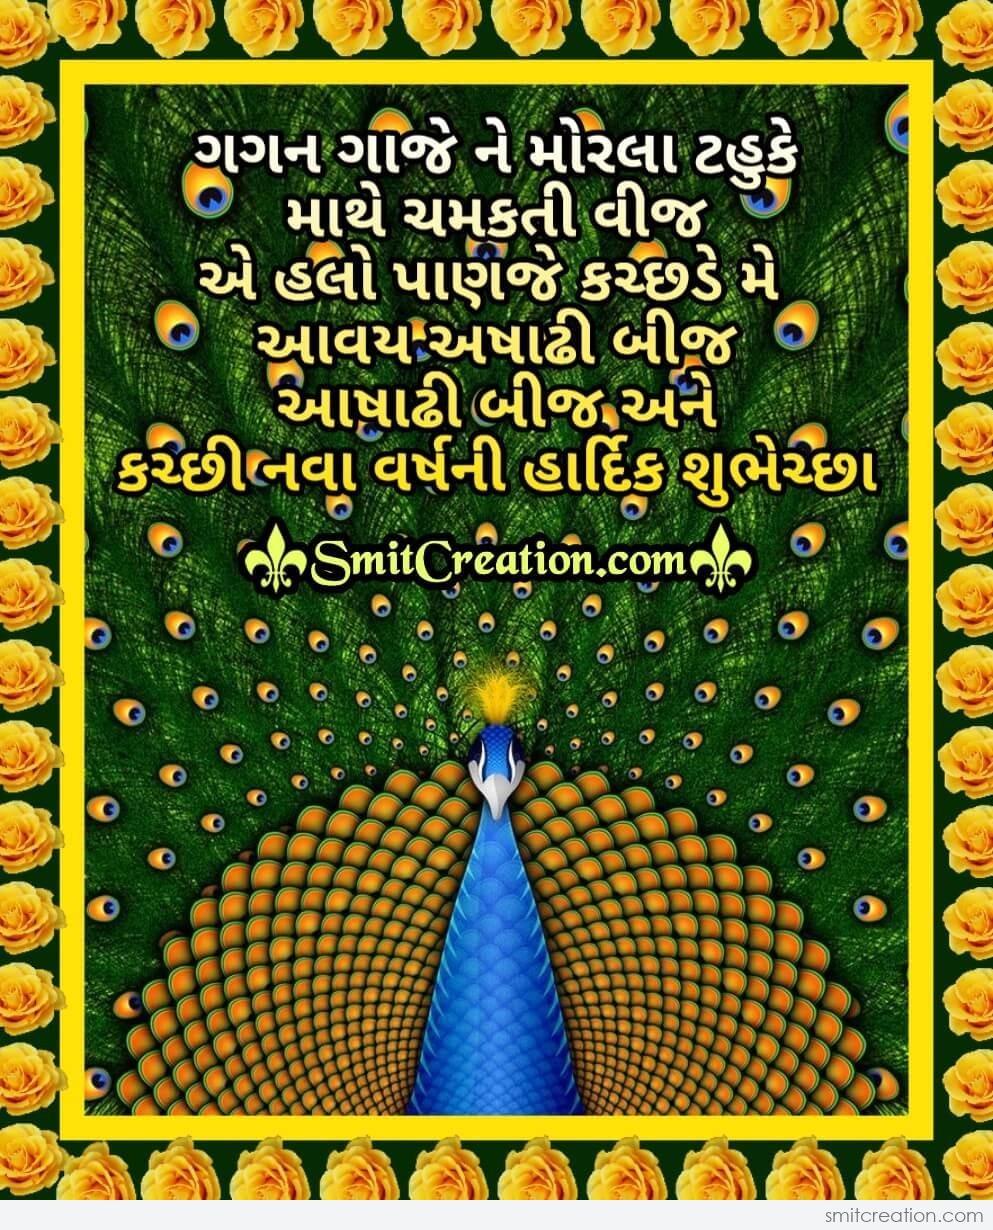 ashadhi beej and kachhi new year gujarati wishes smitcreation com kachhi new year gujarati wishes